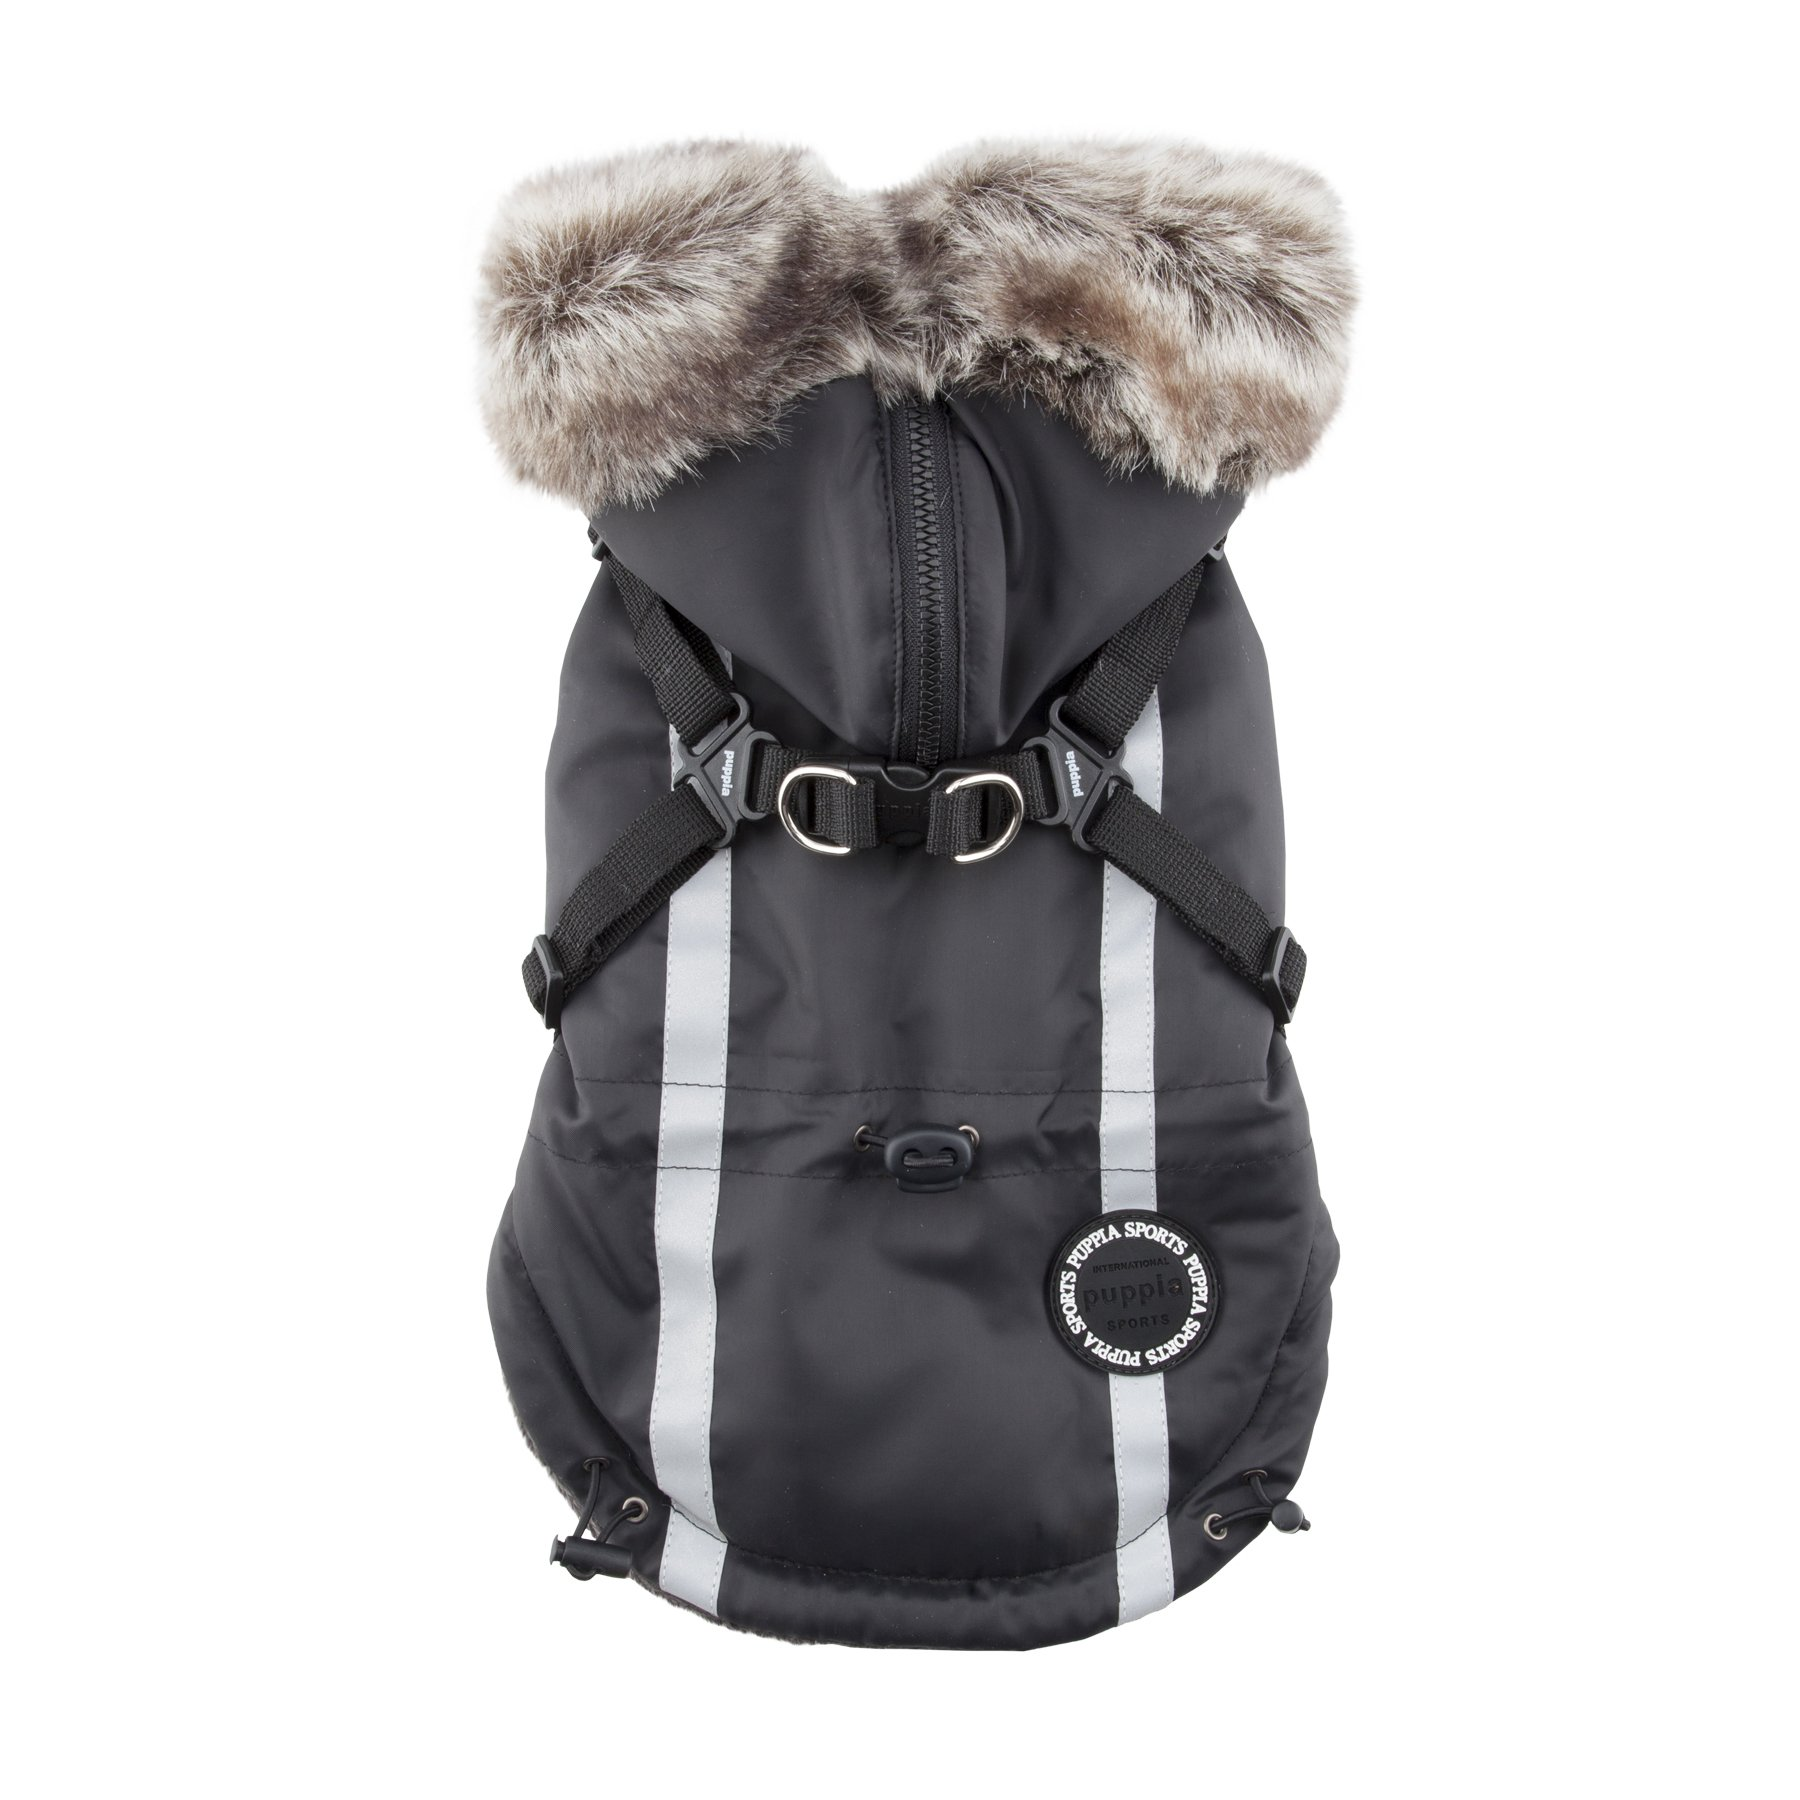 Puppia Clark Winter Fleece Vest, Small, Black